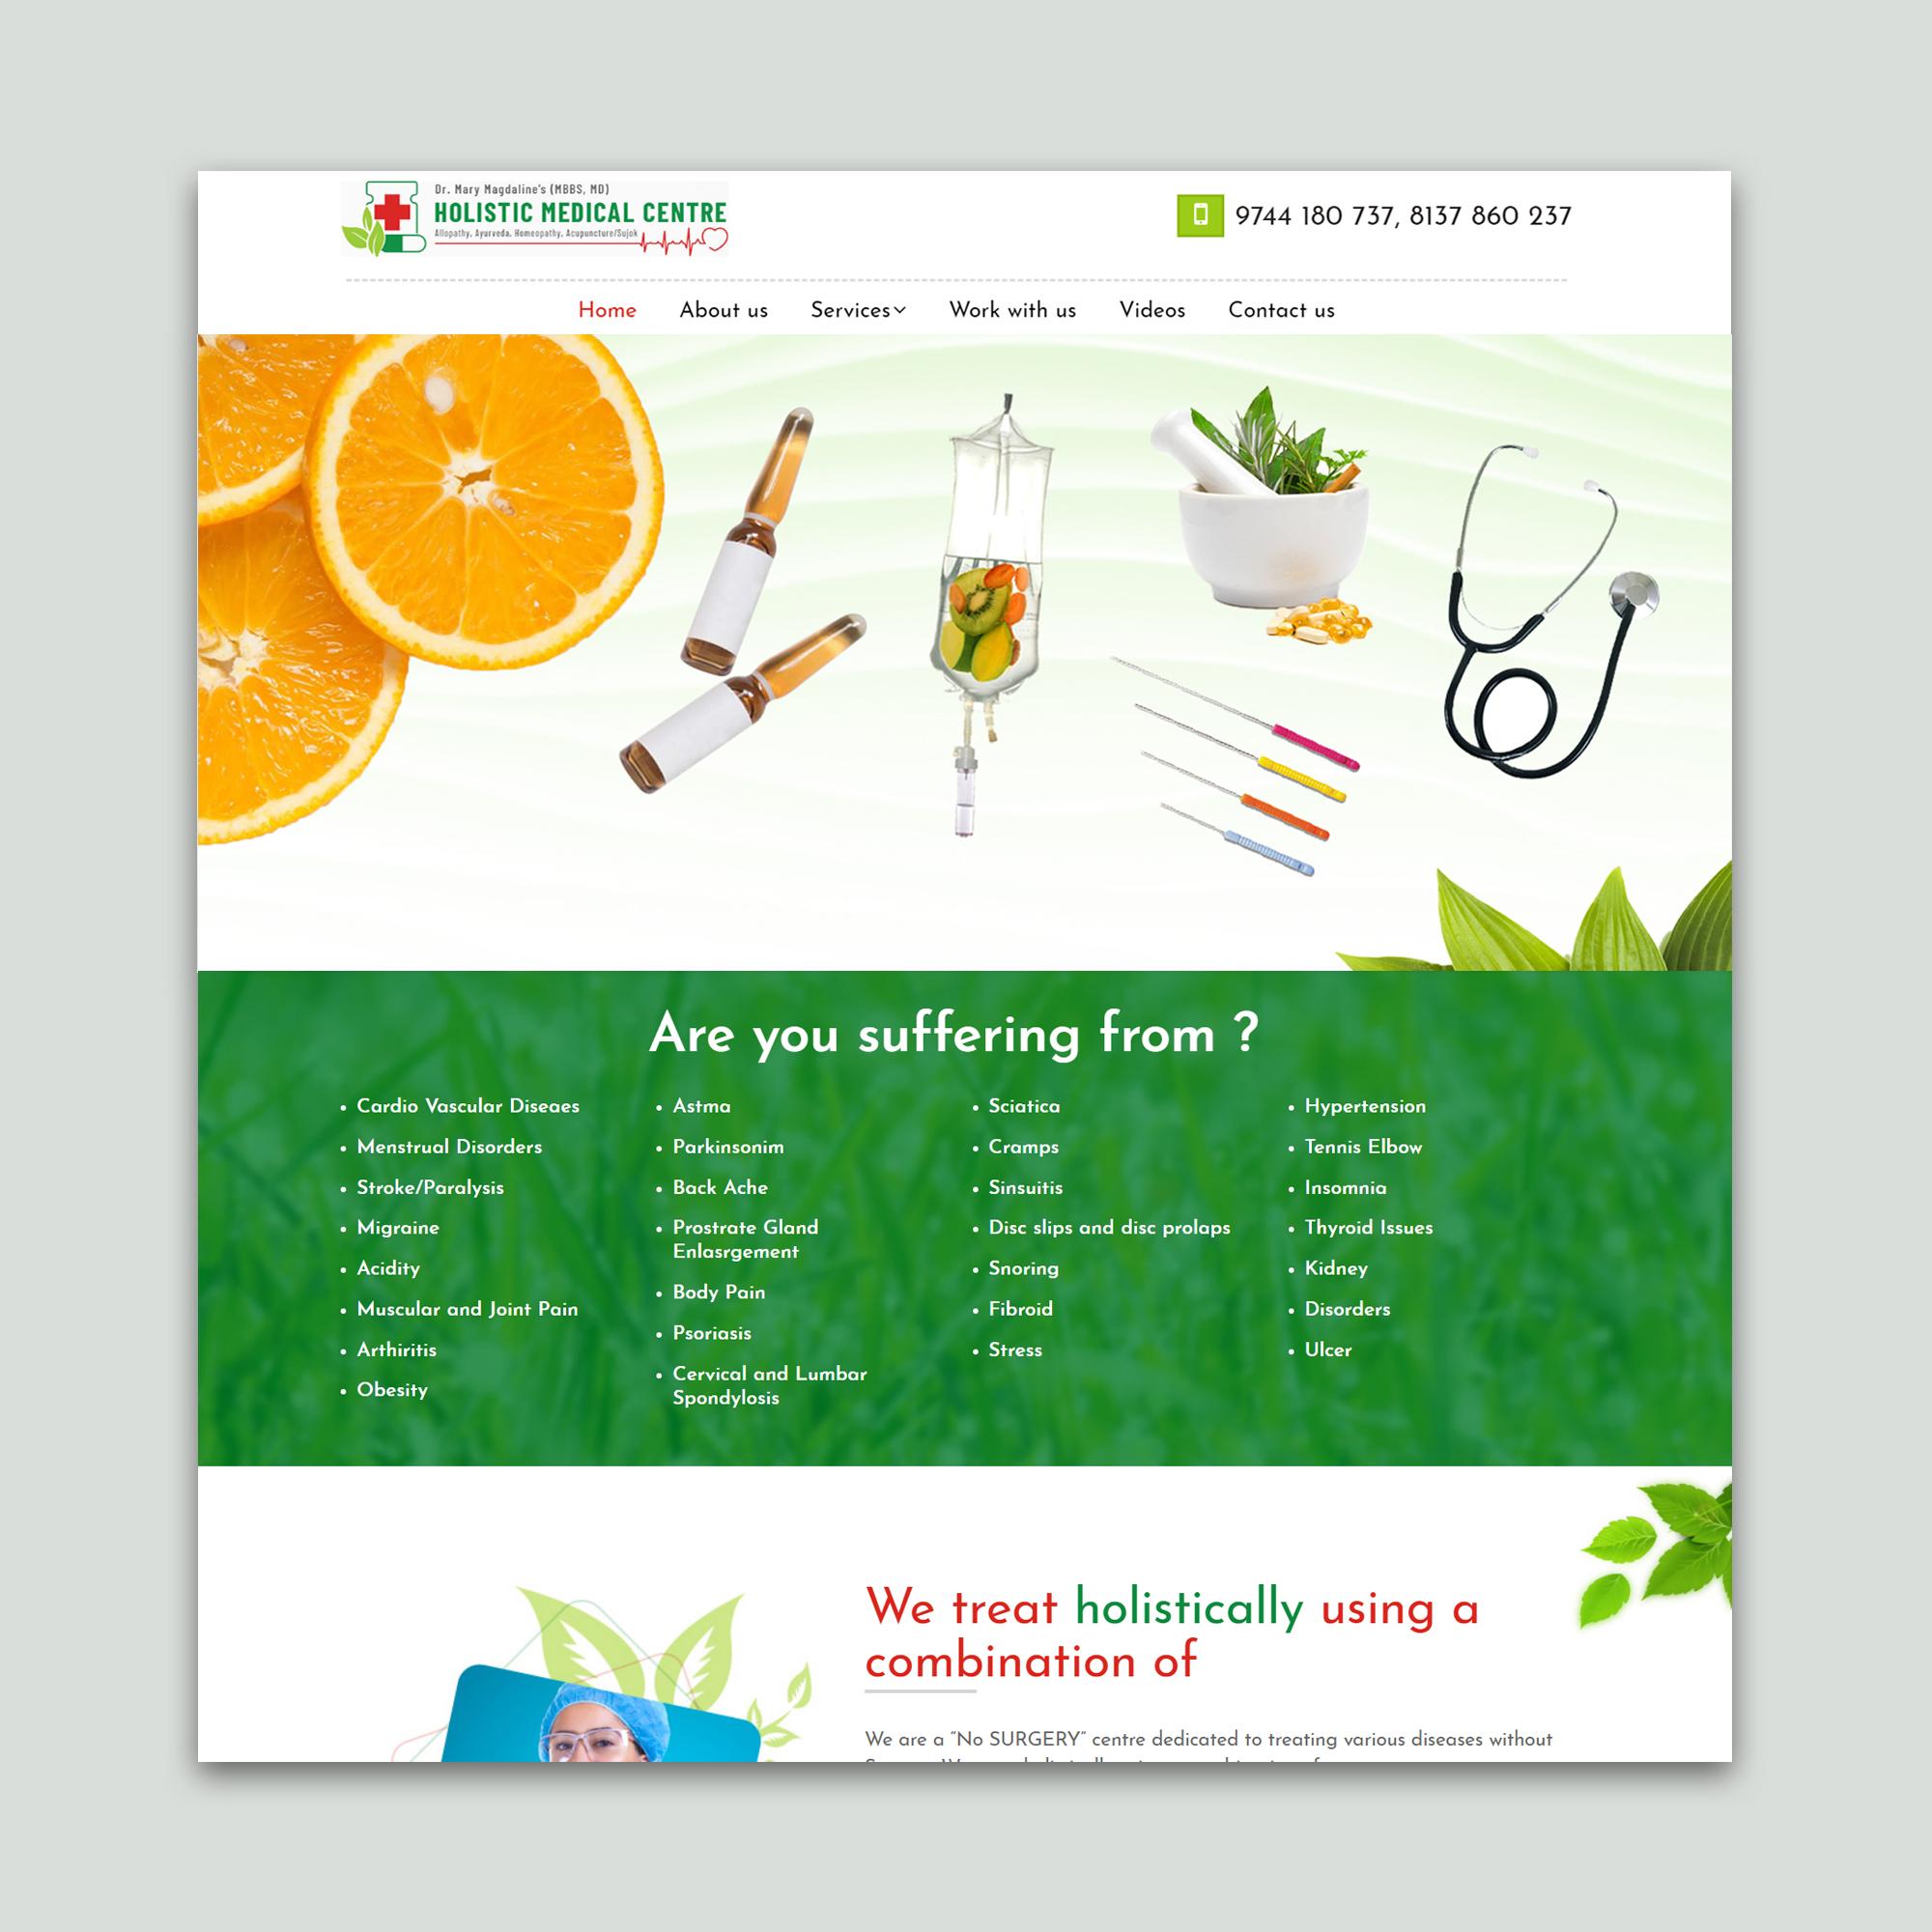 Playful Modern Health And Wellness Banner Ad Design For A Company By Leonardo Pecanha Design 22140079